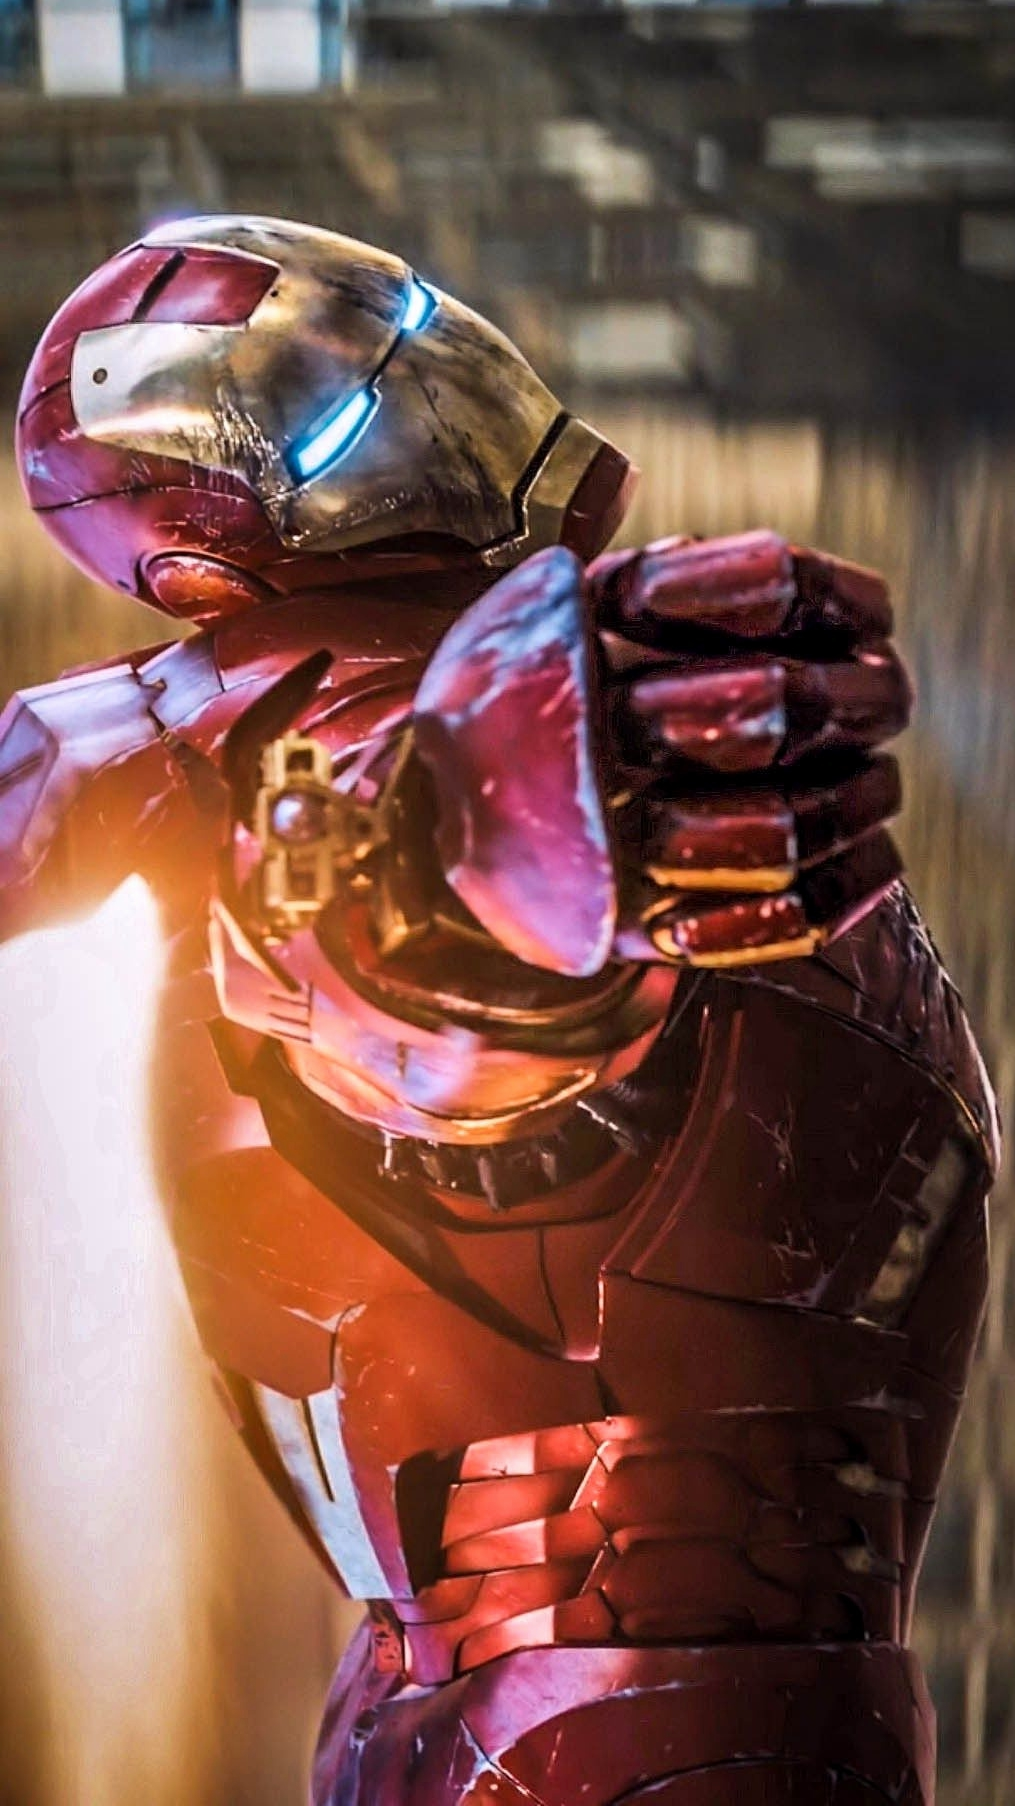 Spiderman Hd Wallpaper Iron Man Suit Hd Avengers Iphone Wallpaper Iphone Wallpapers